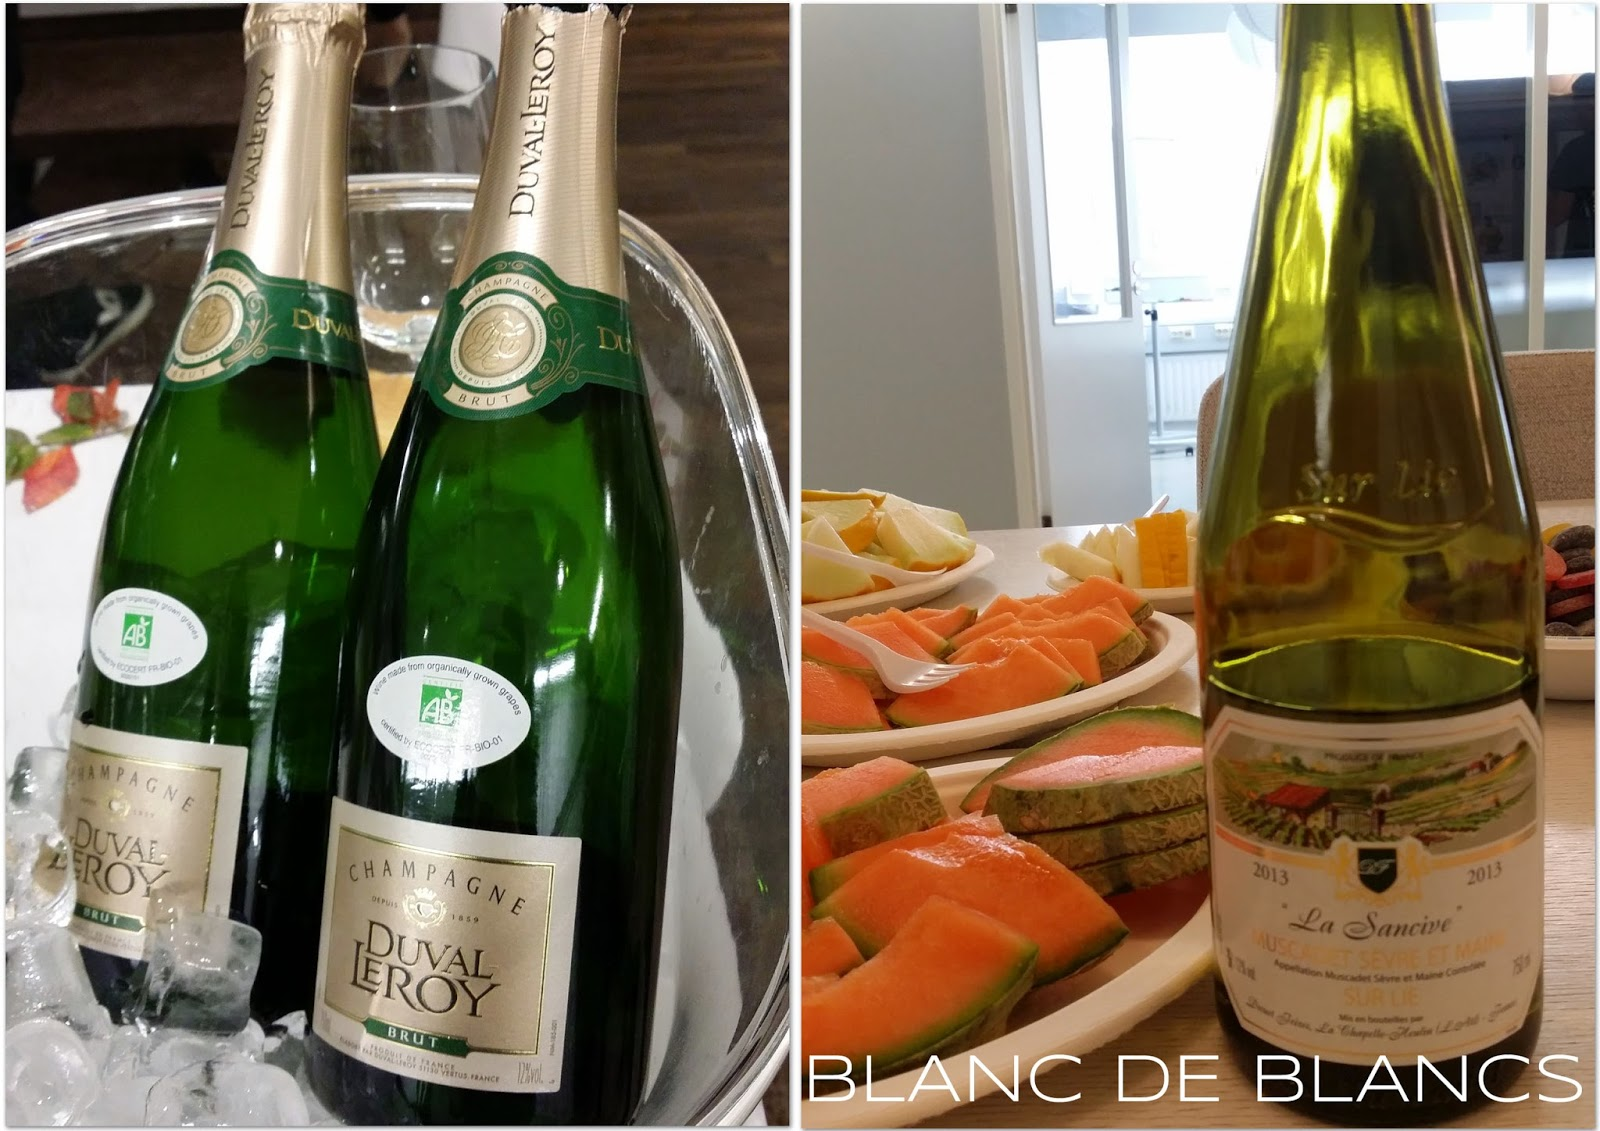 Viinit simpukoille - www.blancdeblancs.fi